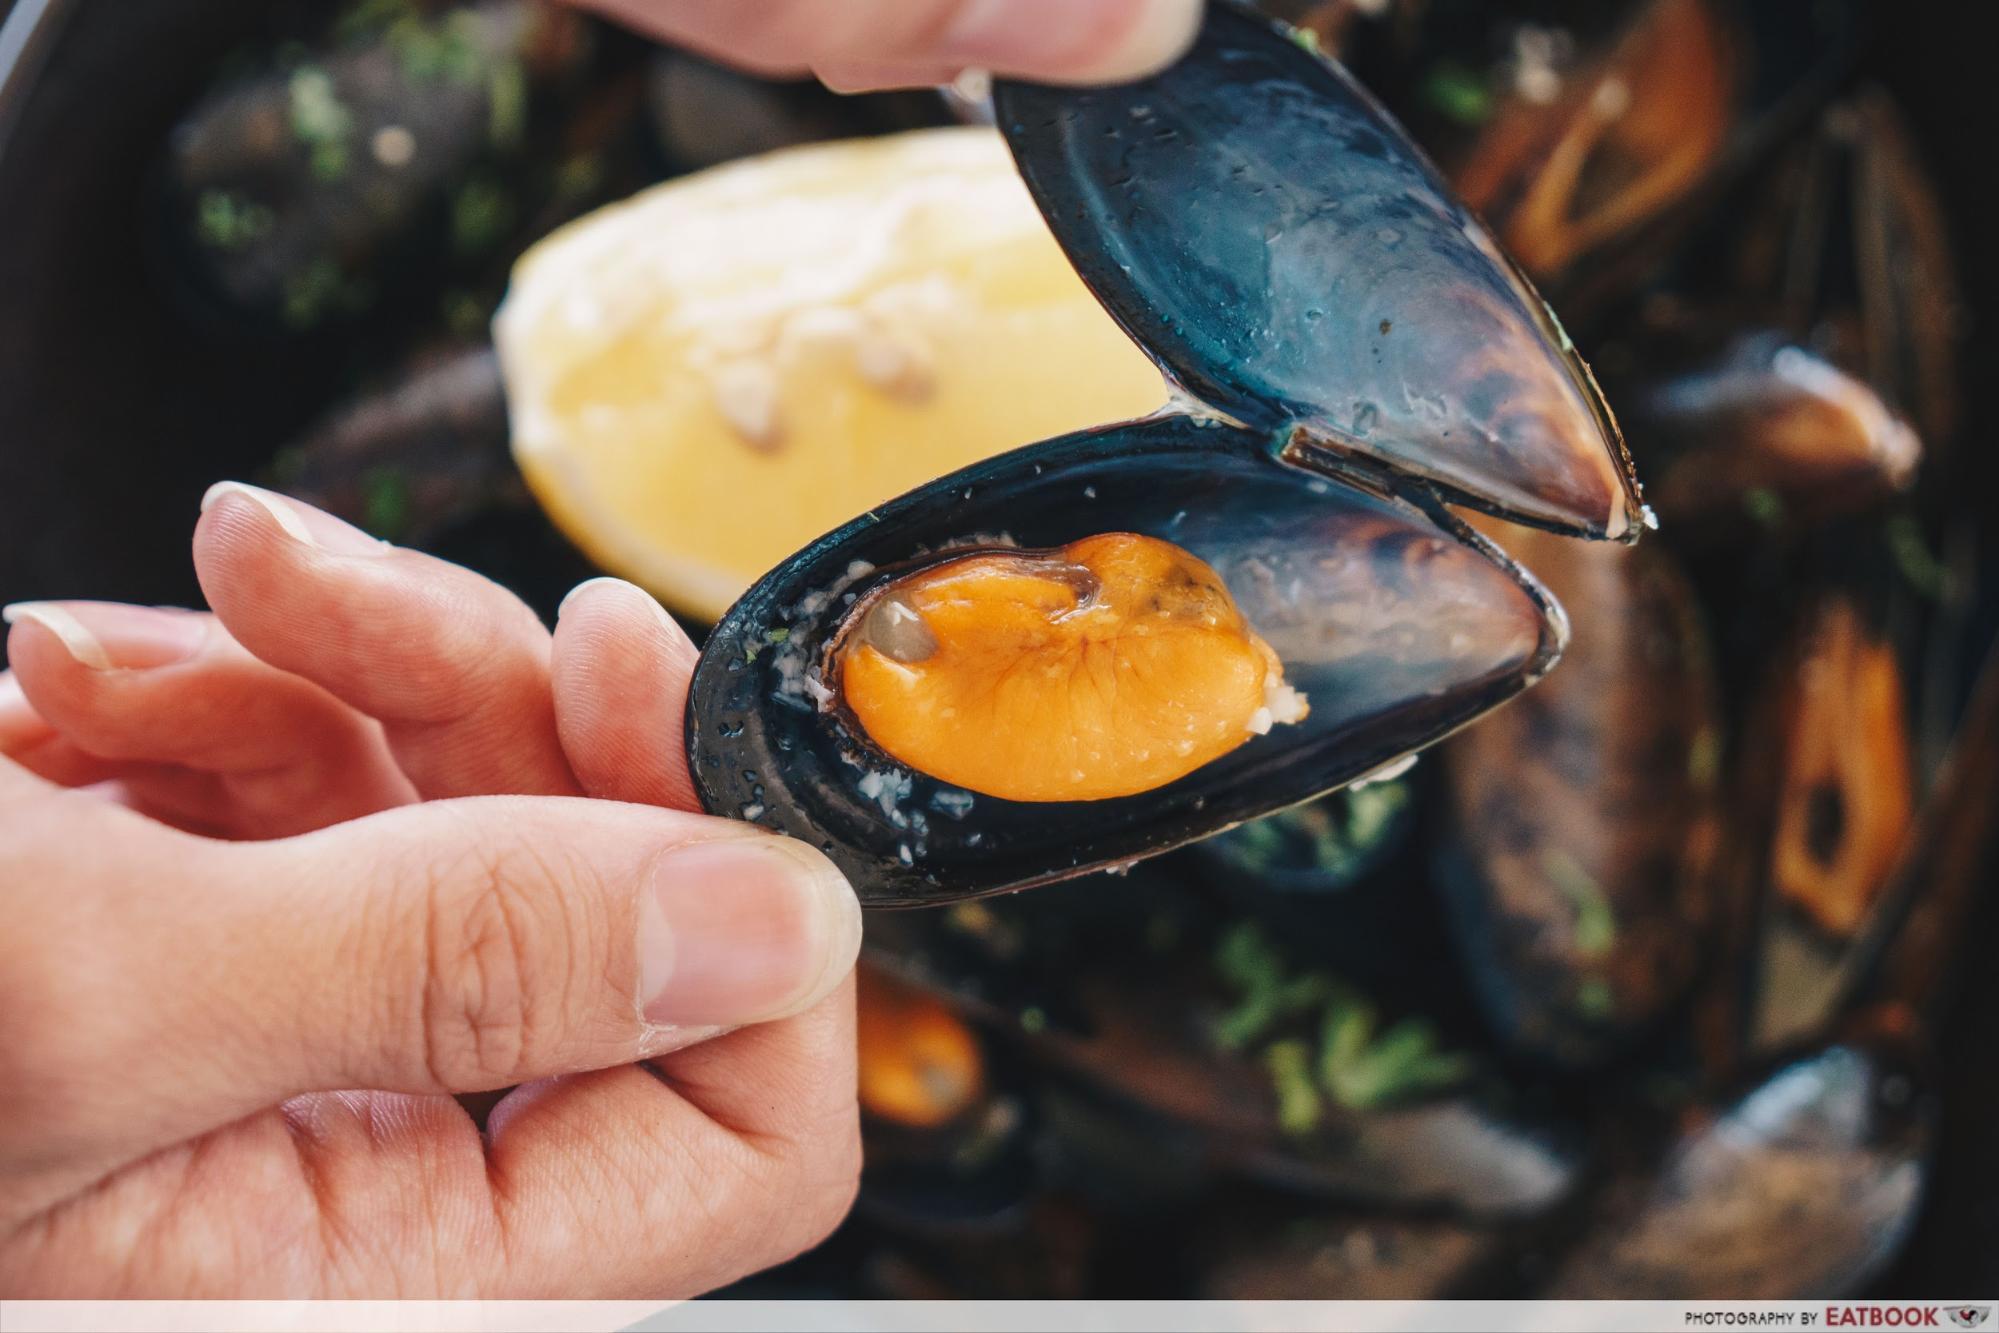 La Pizzeria - Sauteed Mussels